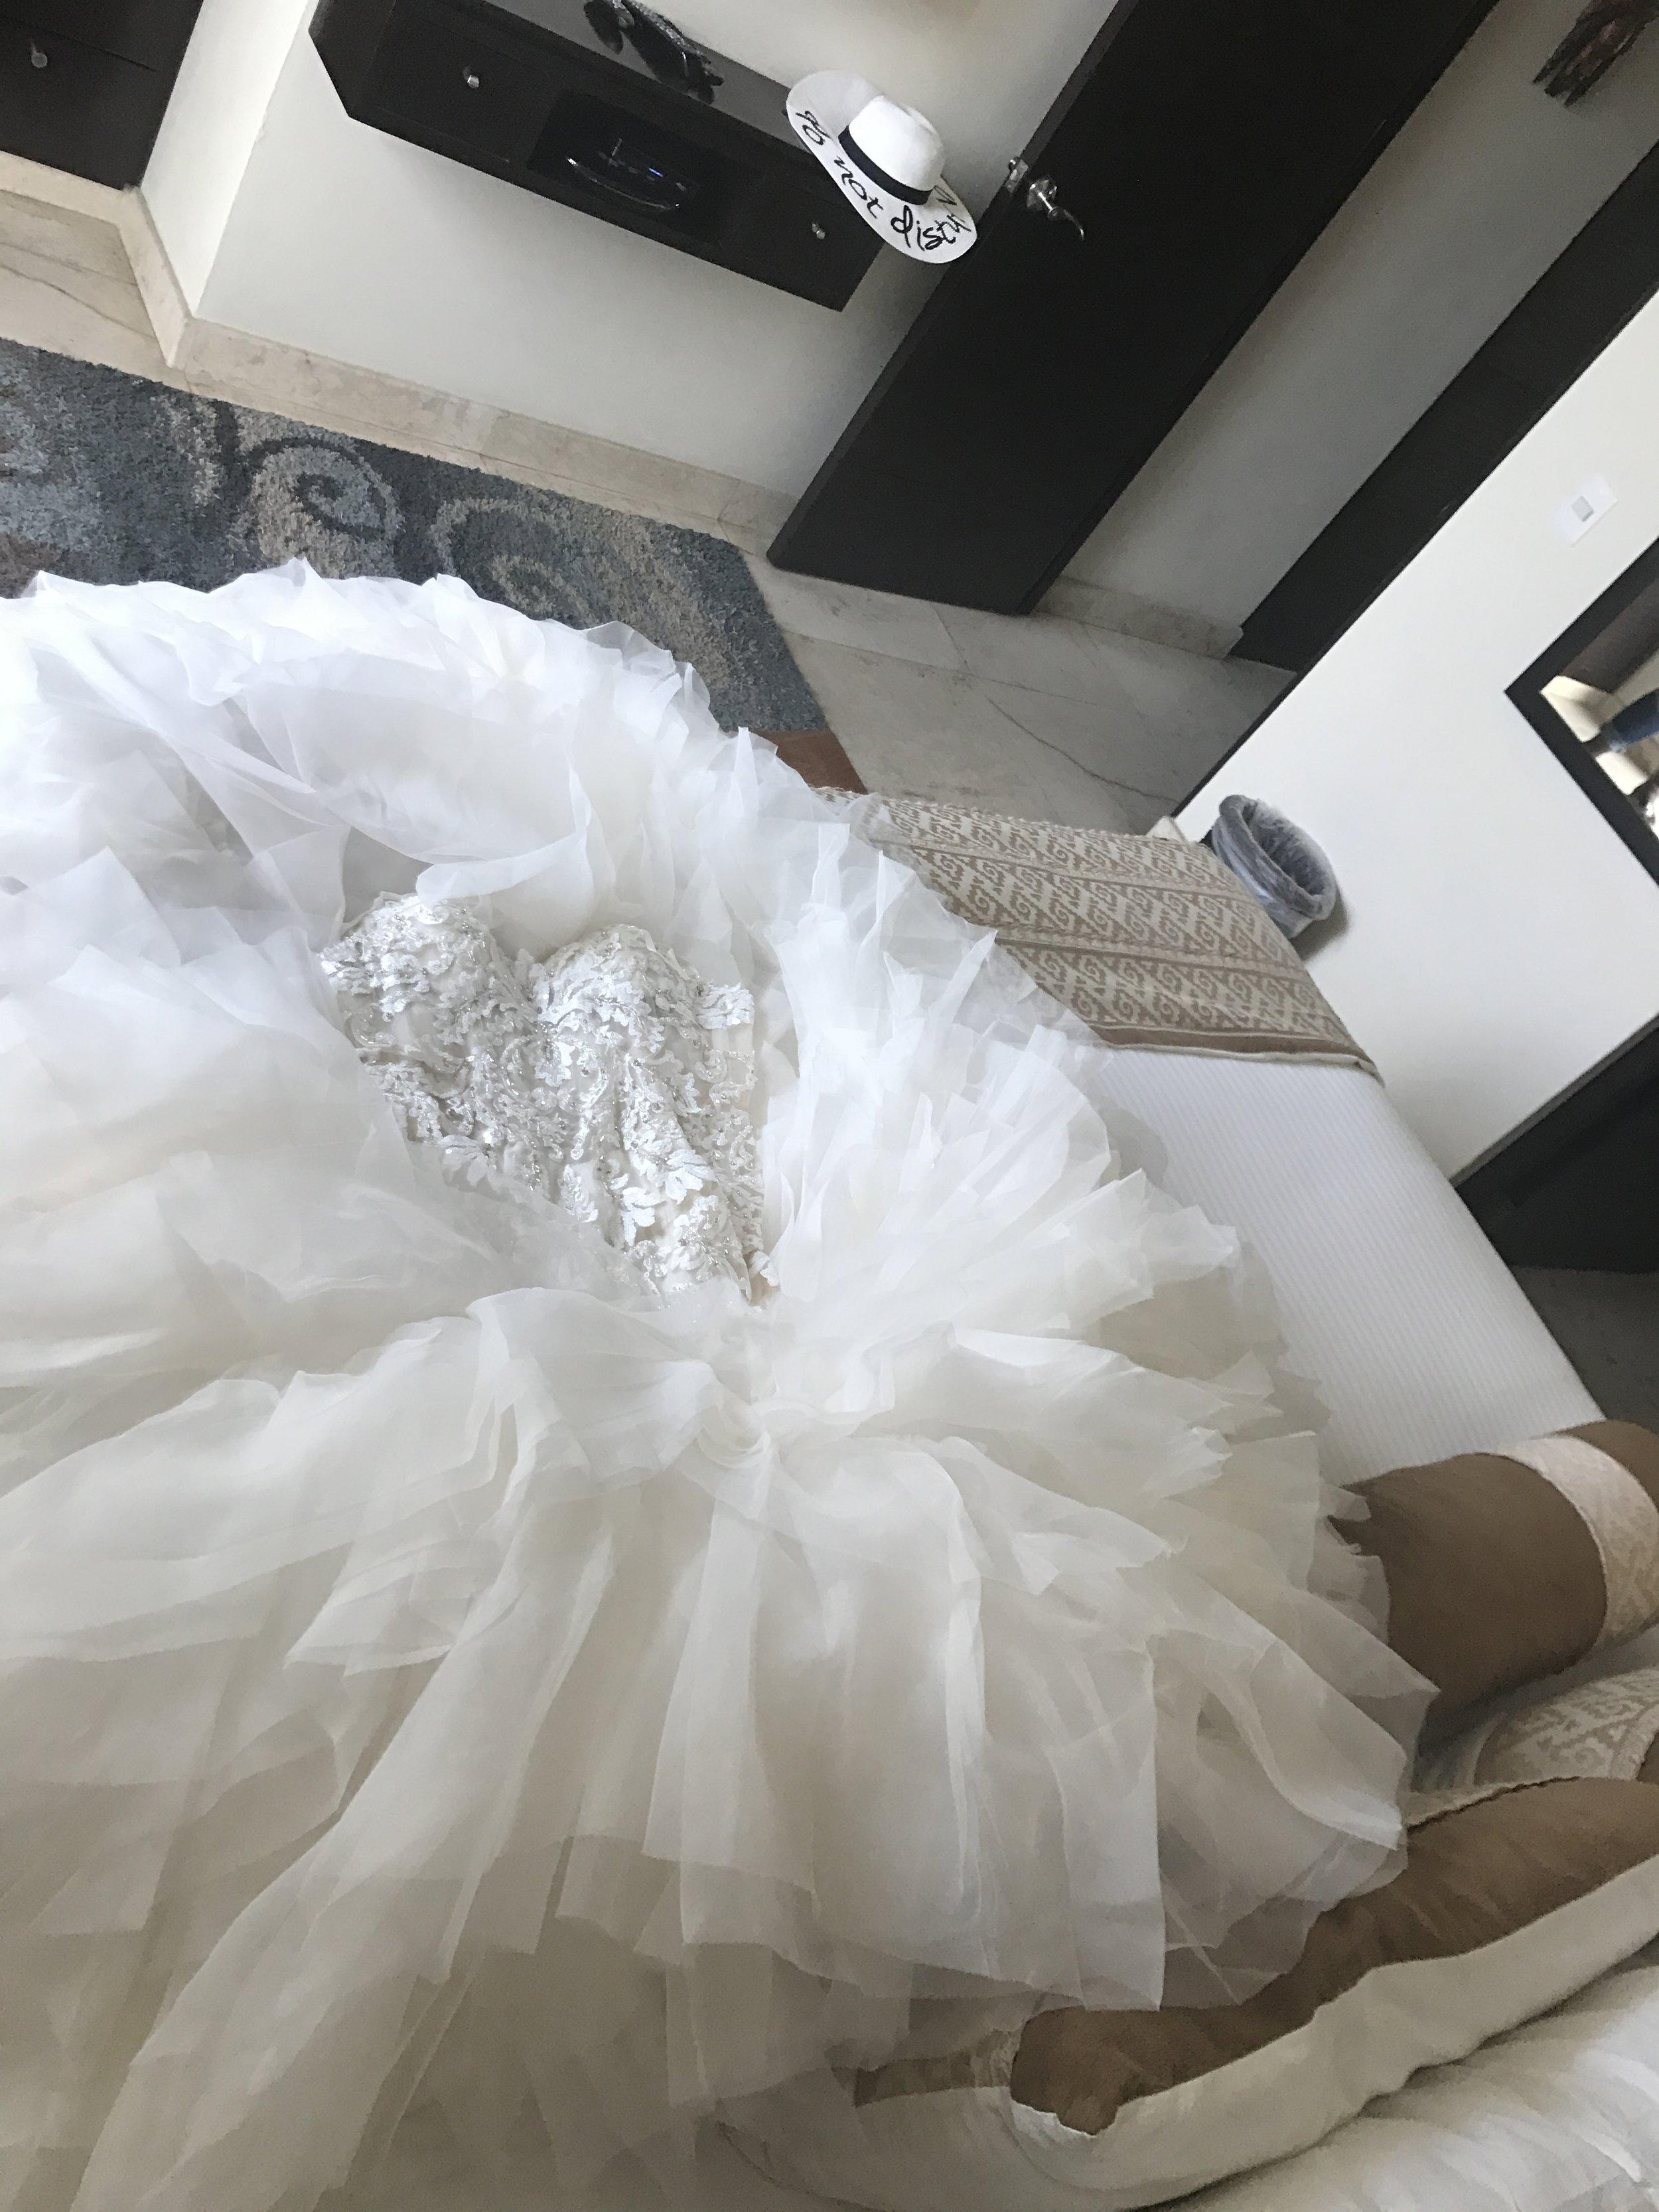 Black Destination Bride - BlackDesti Wedding Countdown Journal - Bridefriends Podcast - 1 Playa del Carmen Mexico - El Taj Bridal Suite Wedding Dress UnPacked.JPG